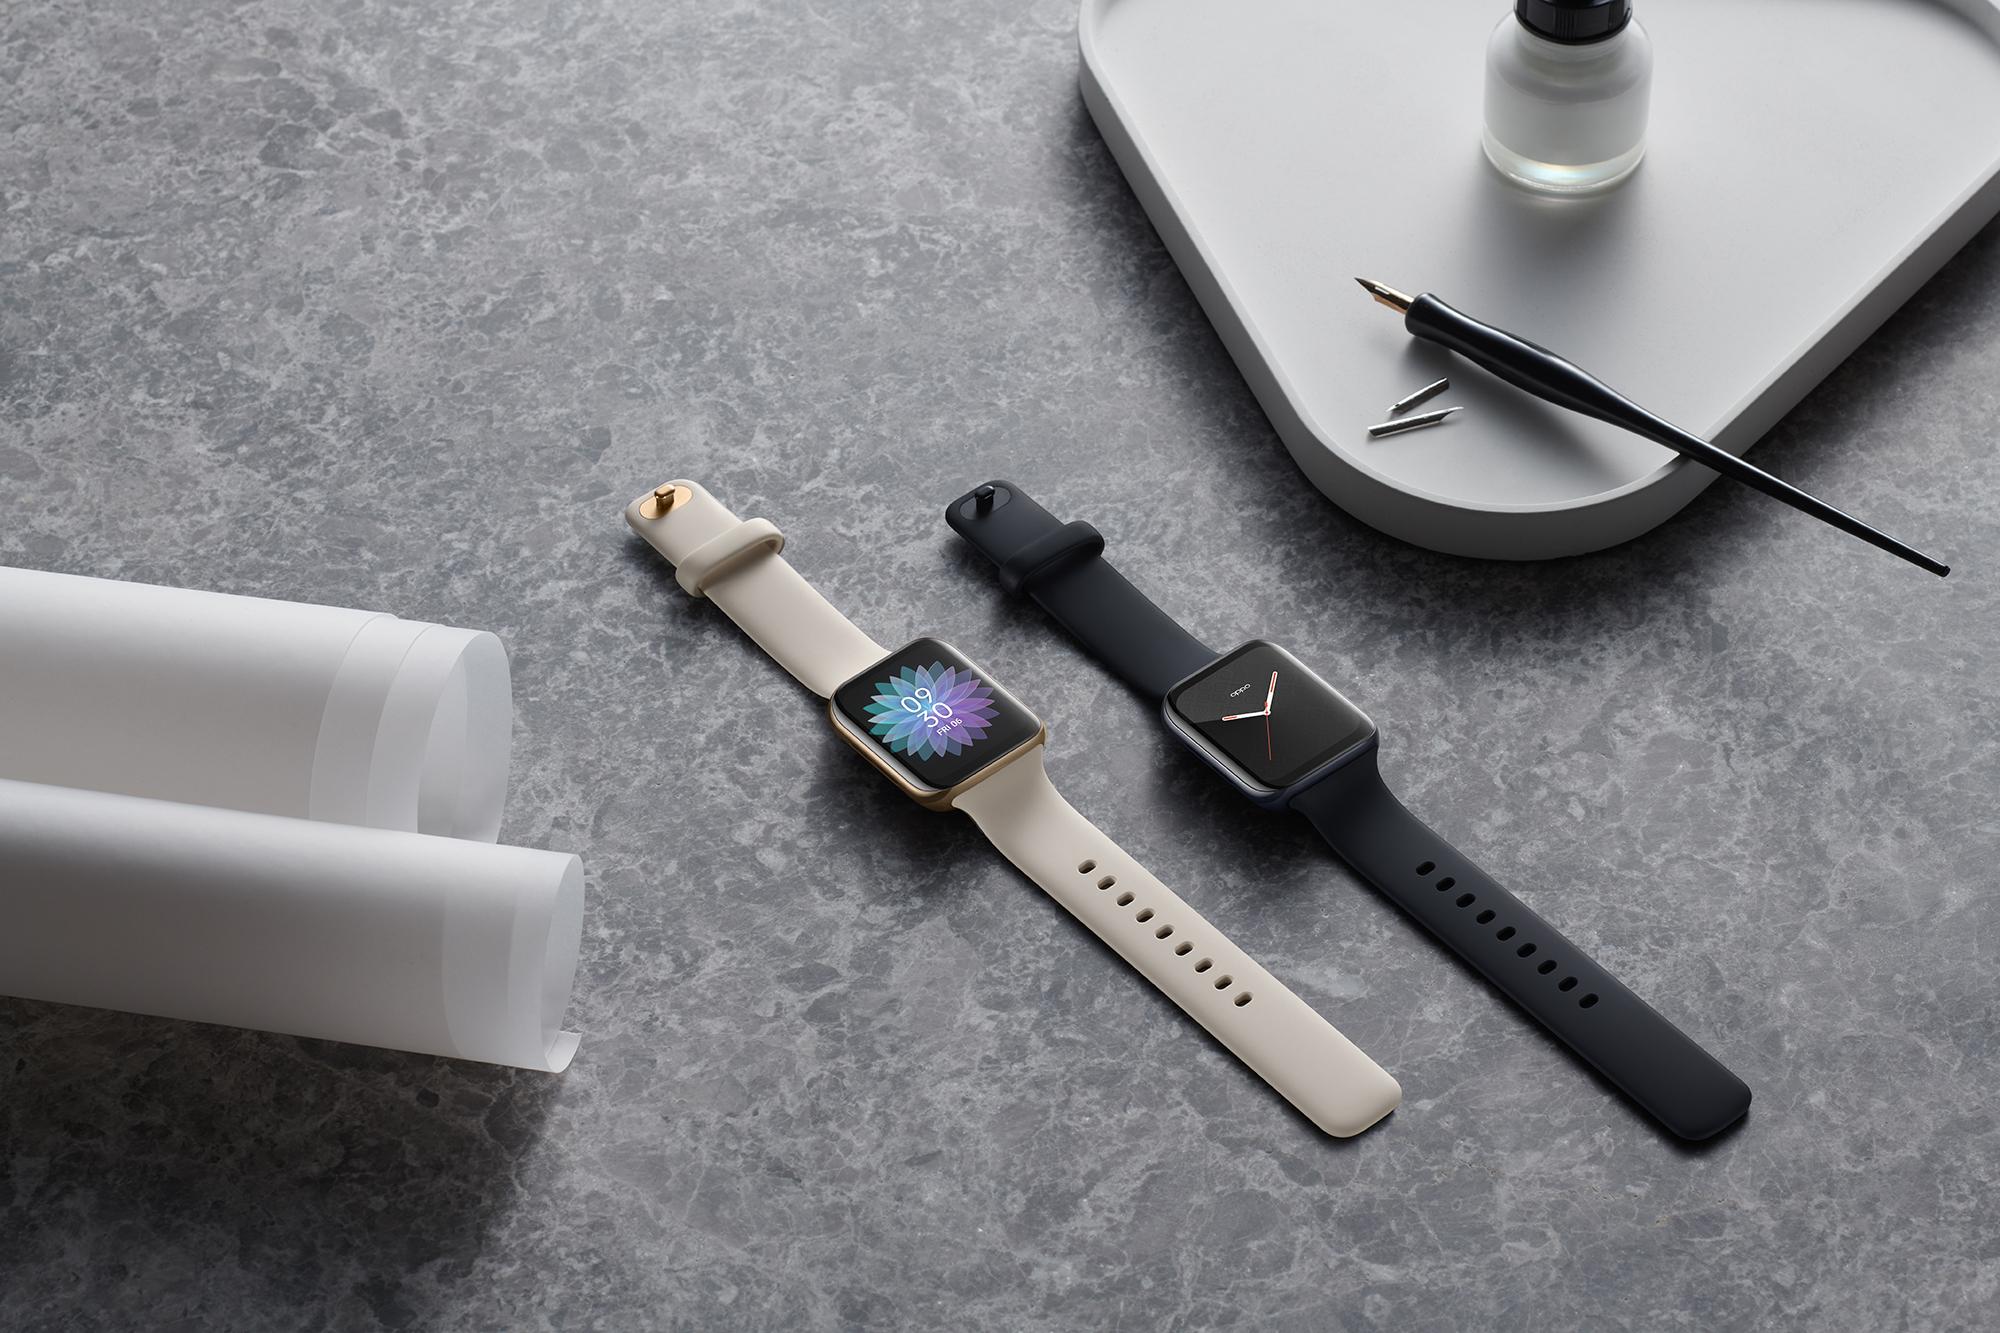 OPPO Watch 系列提供智慧與長續航兩種續航模式,在長續航模式下46mm版本最長可維持21天不斷電,便利又省電。